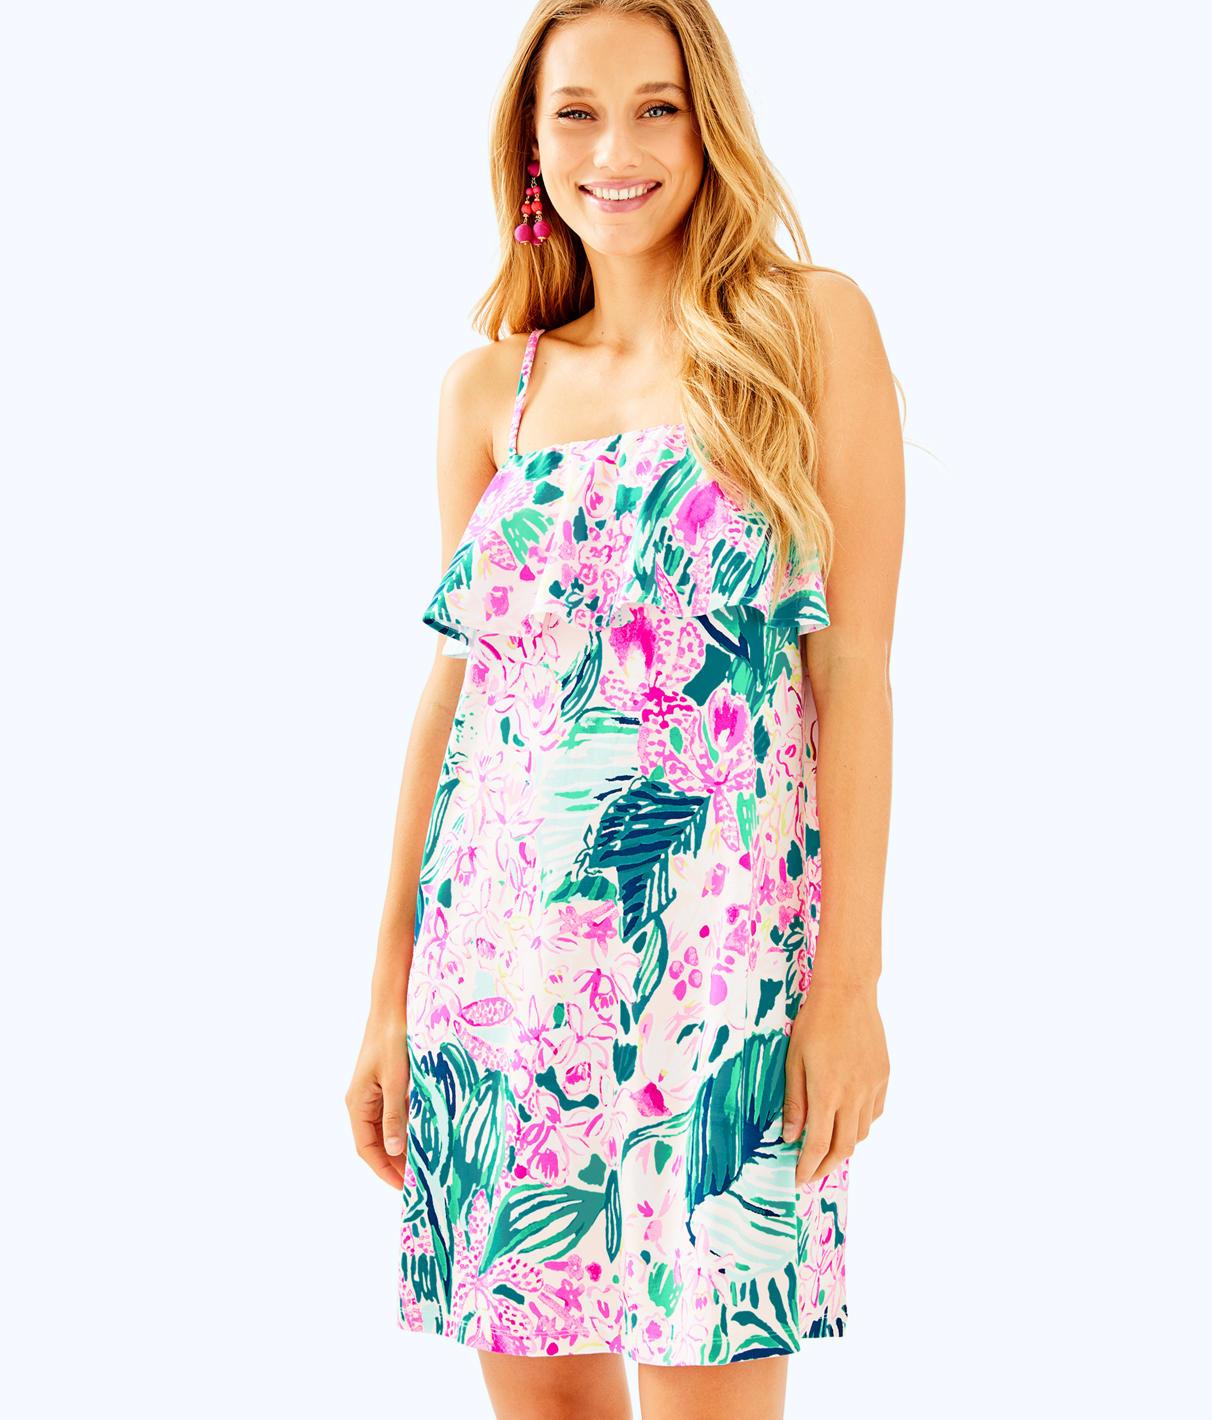 Lilly Pulitzer Annastasha Dress